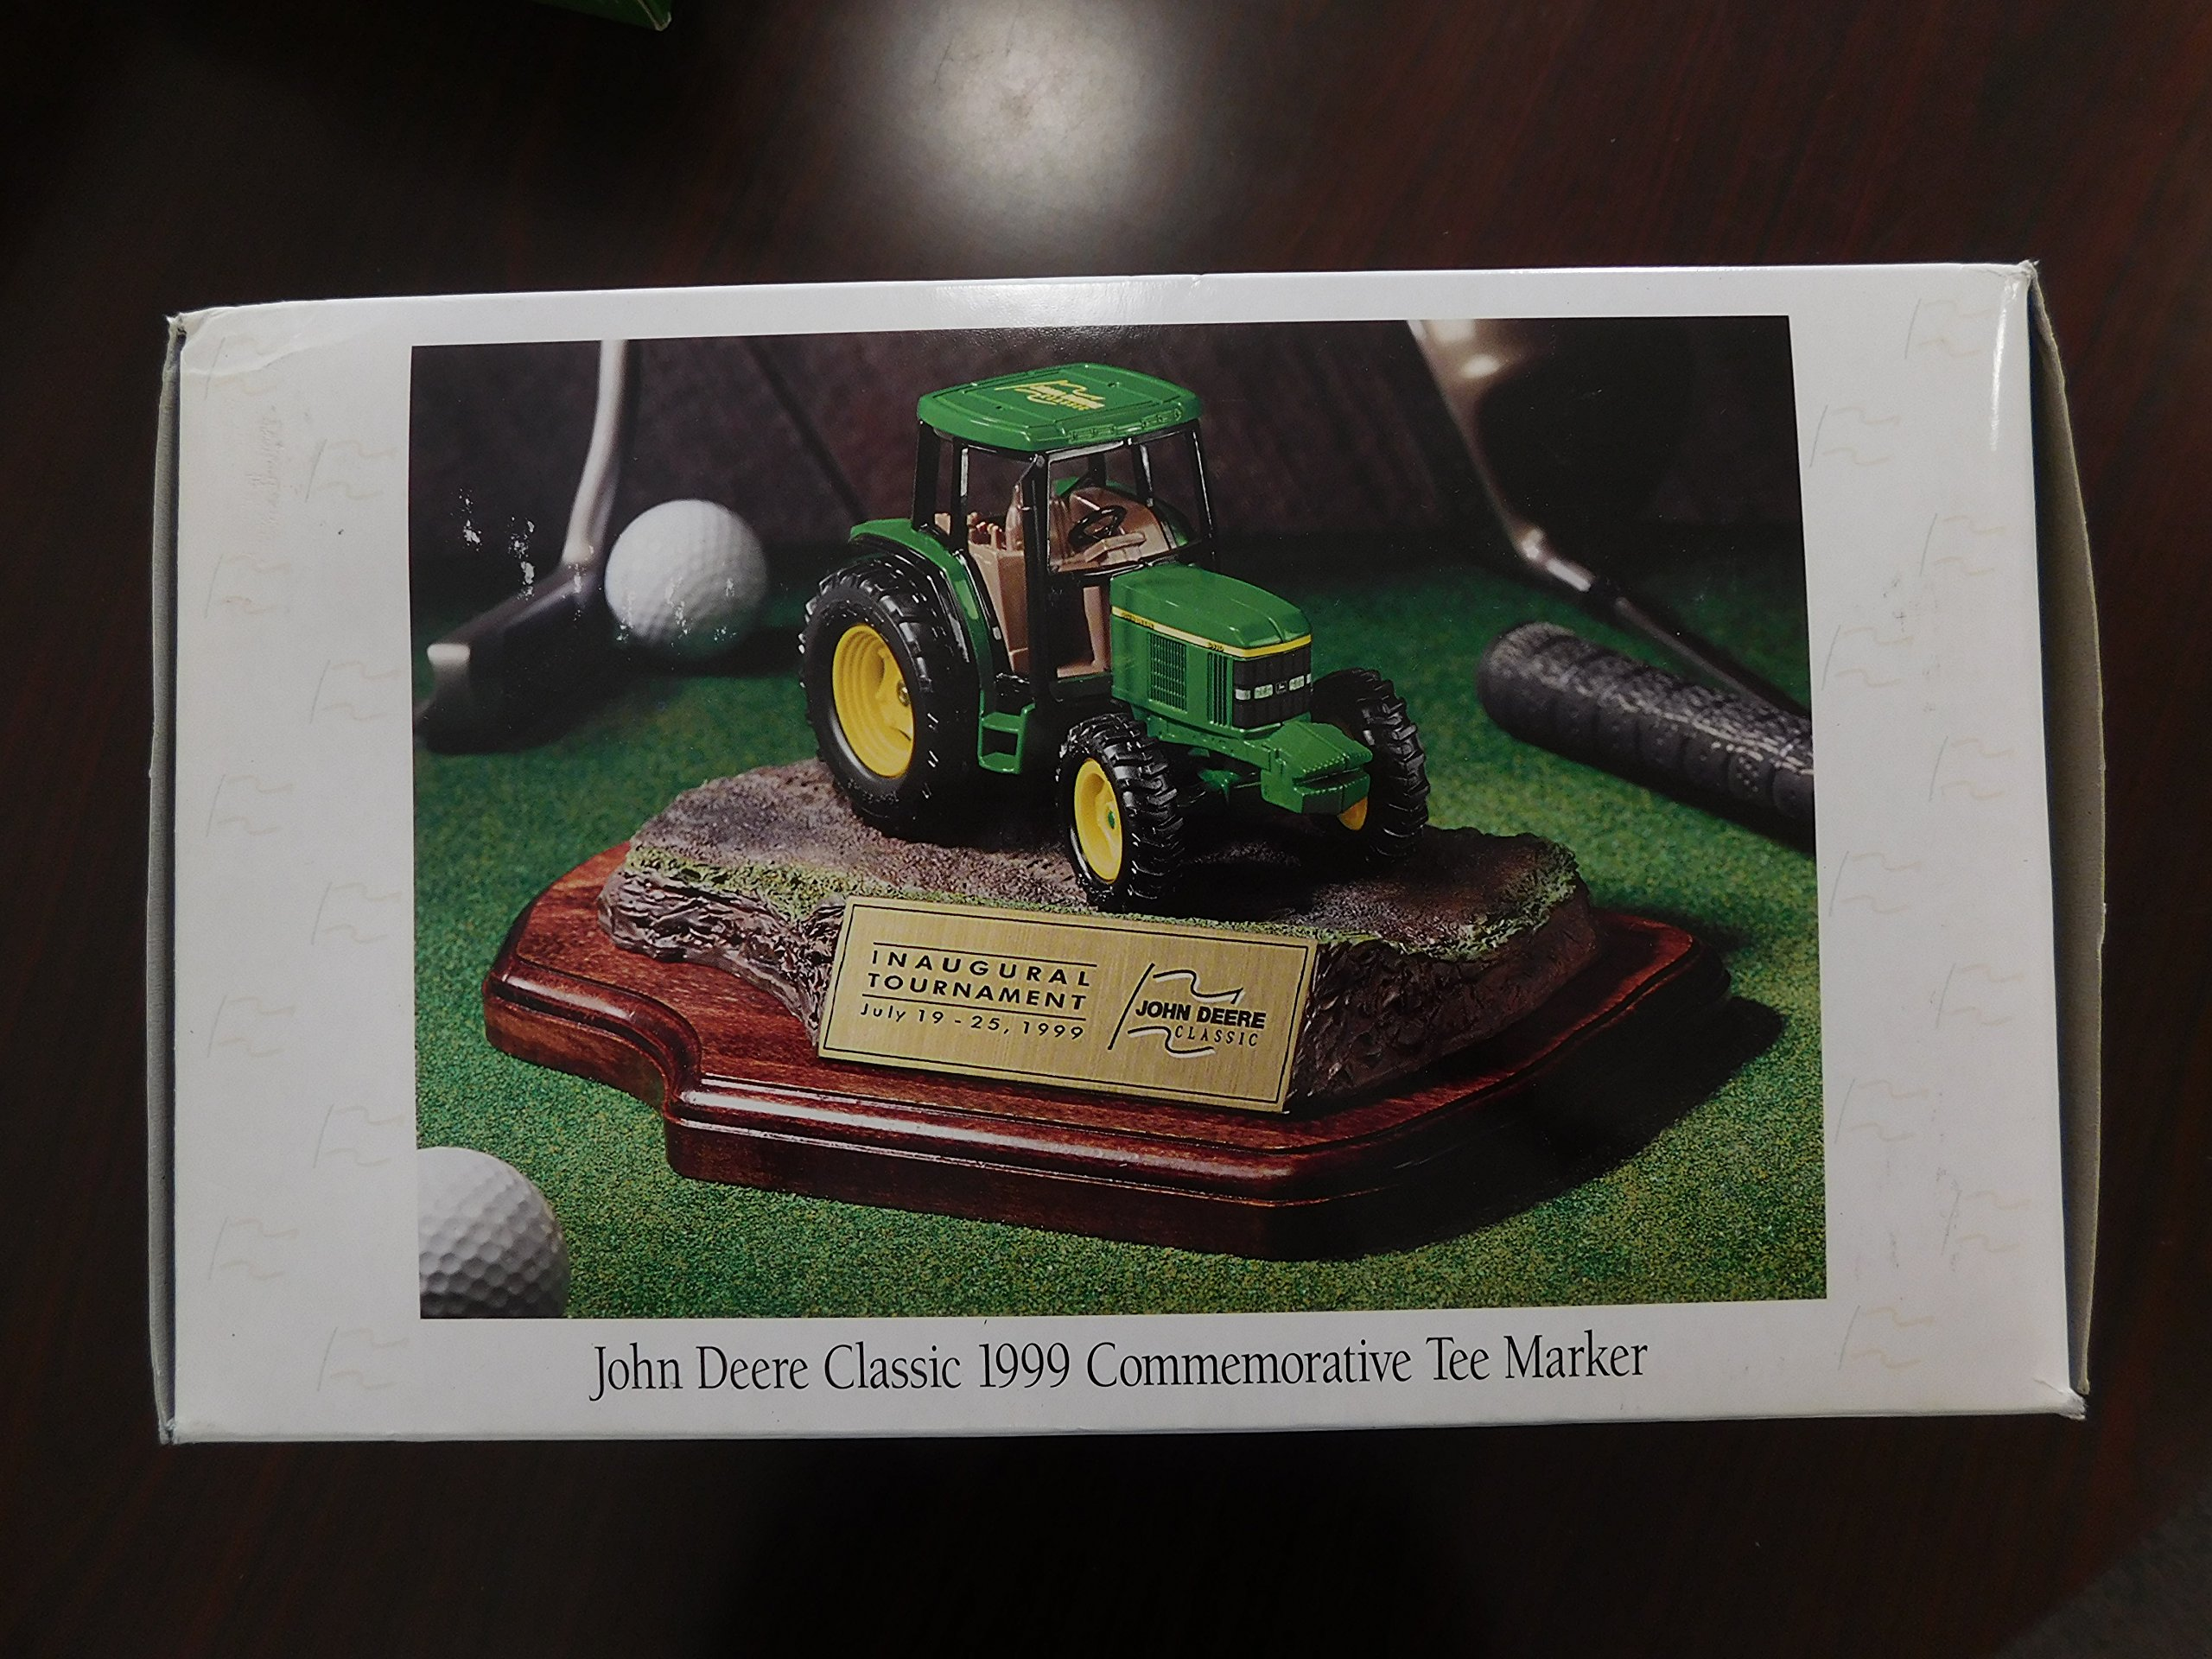 John Deere Classic Inaugural Tournament July 19-25, 1999, Commemorative Tee Maker, Very Rare Date